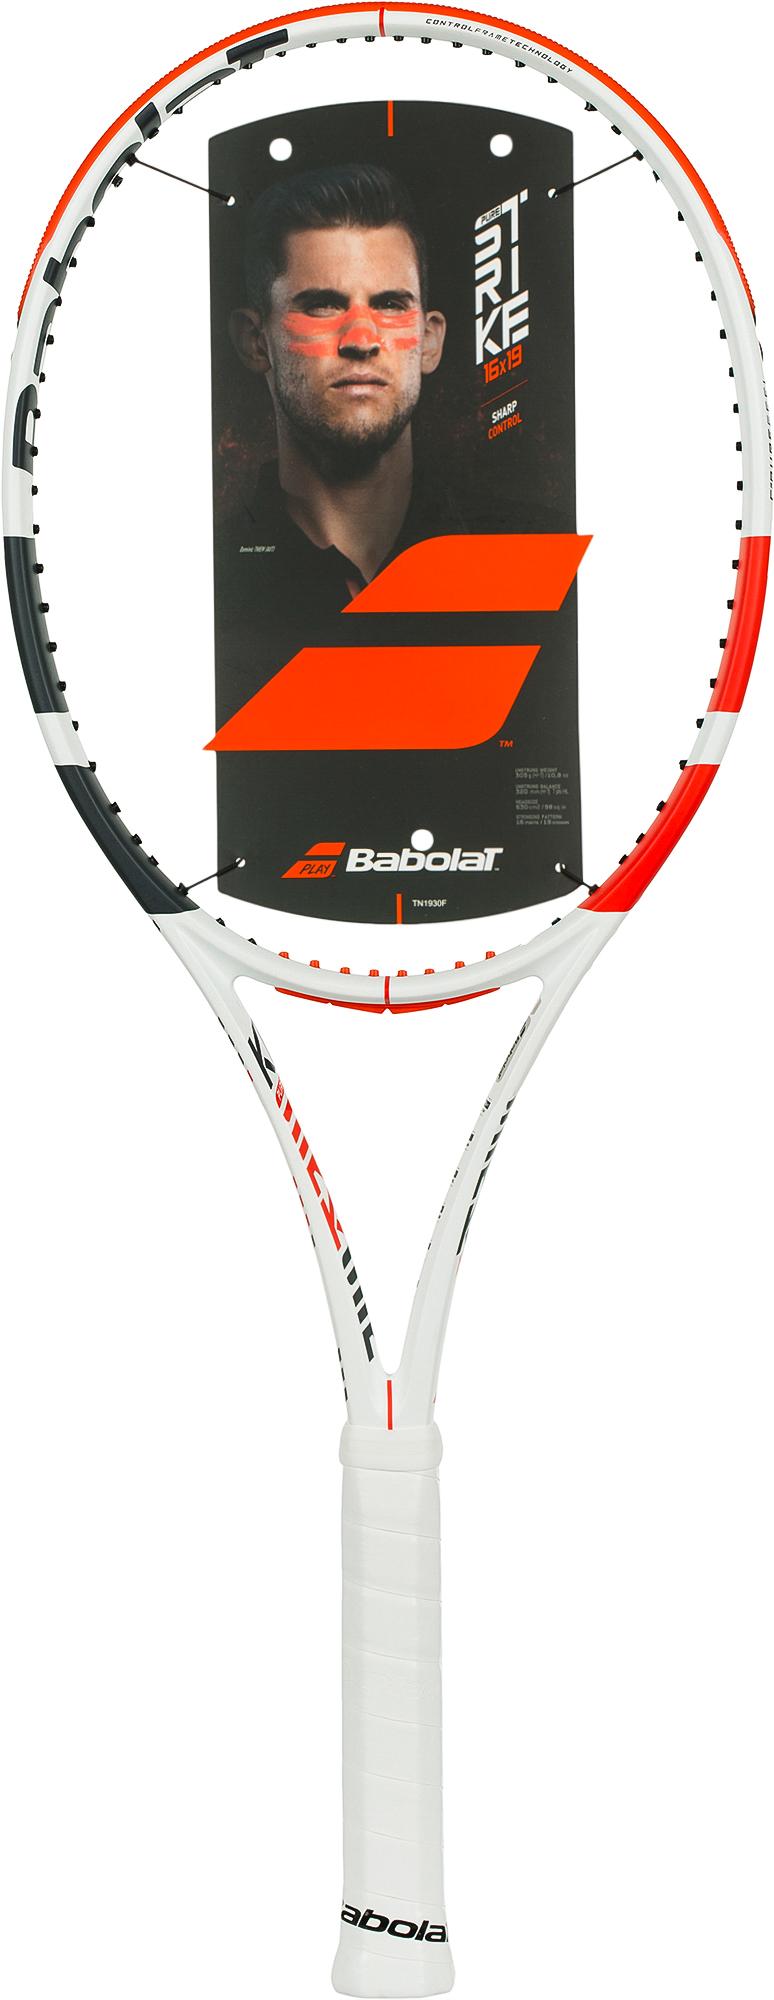 Babolat Ракетка для большого тенниса Babolat PURE STRIKE 16/19 27 babolat ракетка для большого тенниса babolat pure strike team размер 3